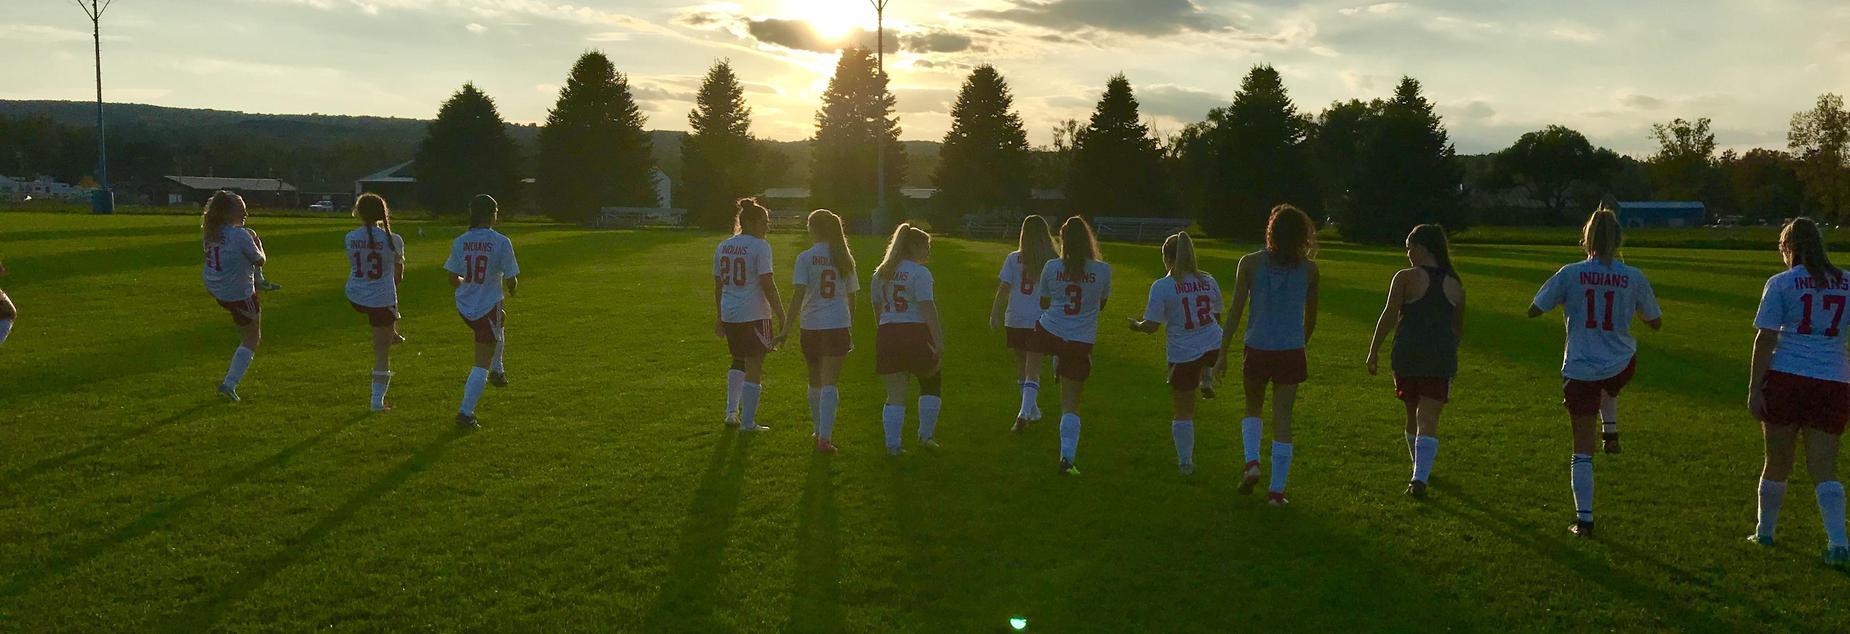 Soccer in the setting sun